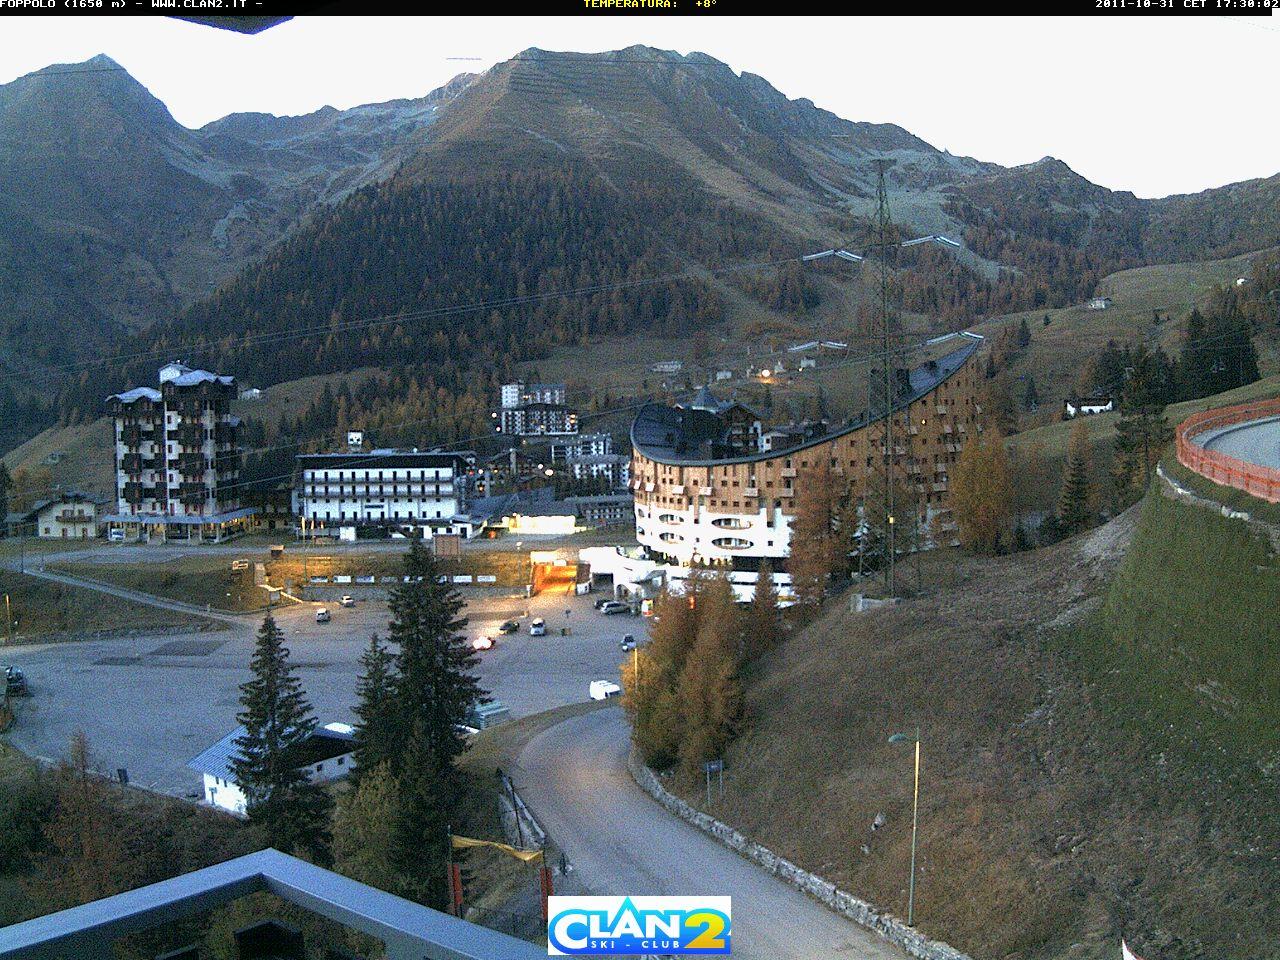 Webcam alpine Foppolo